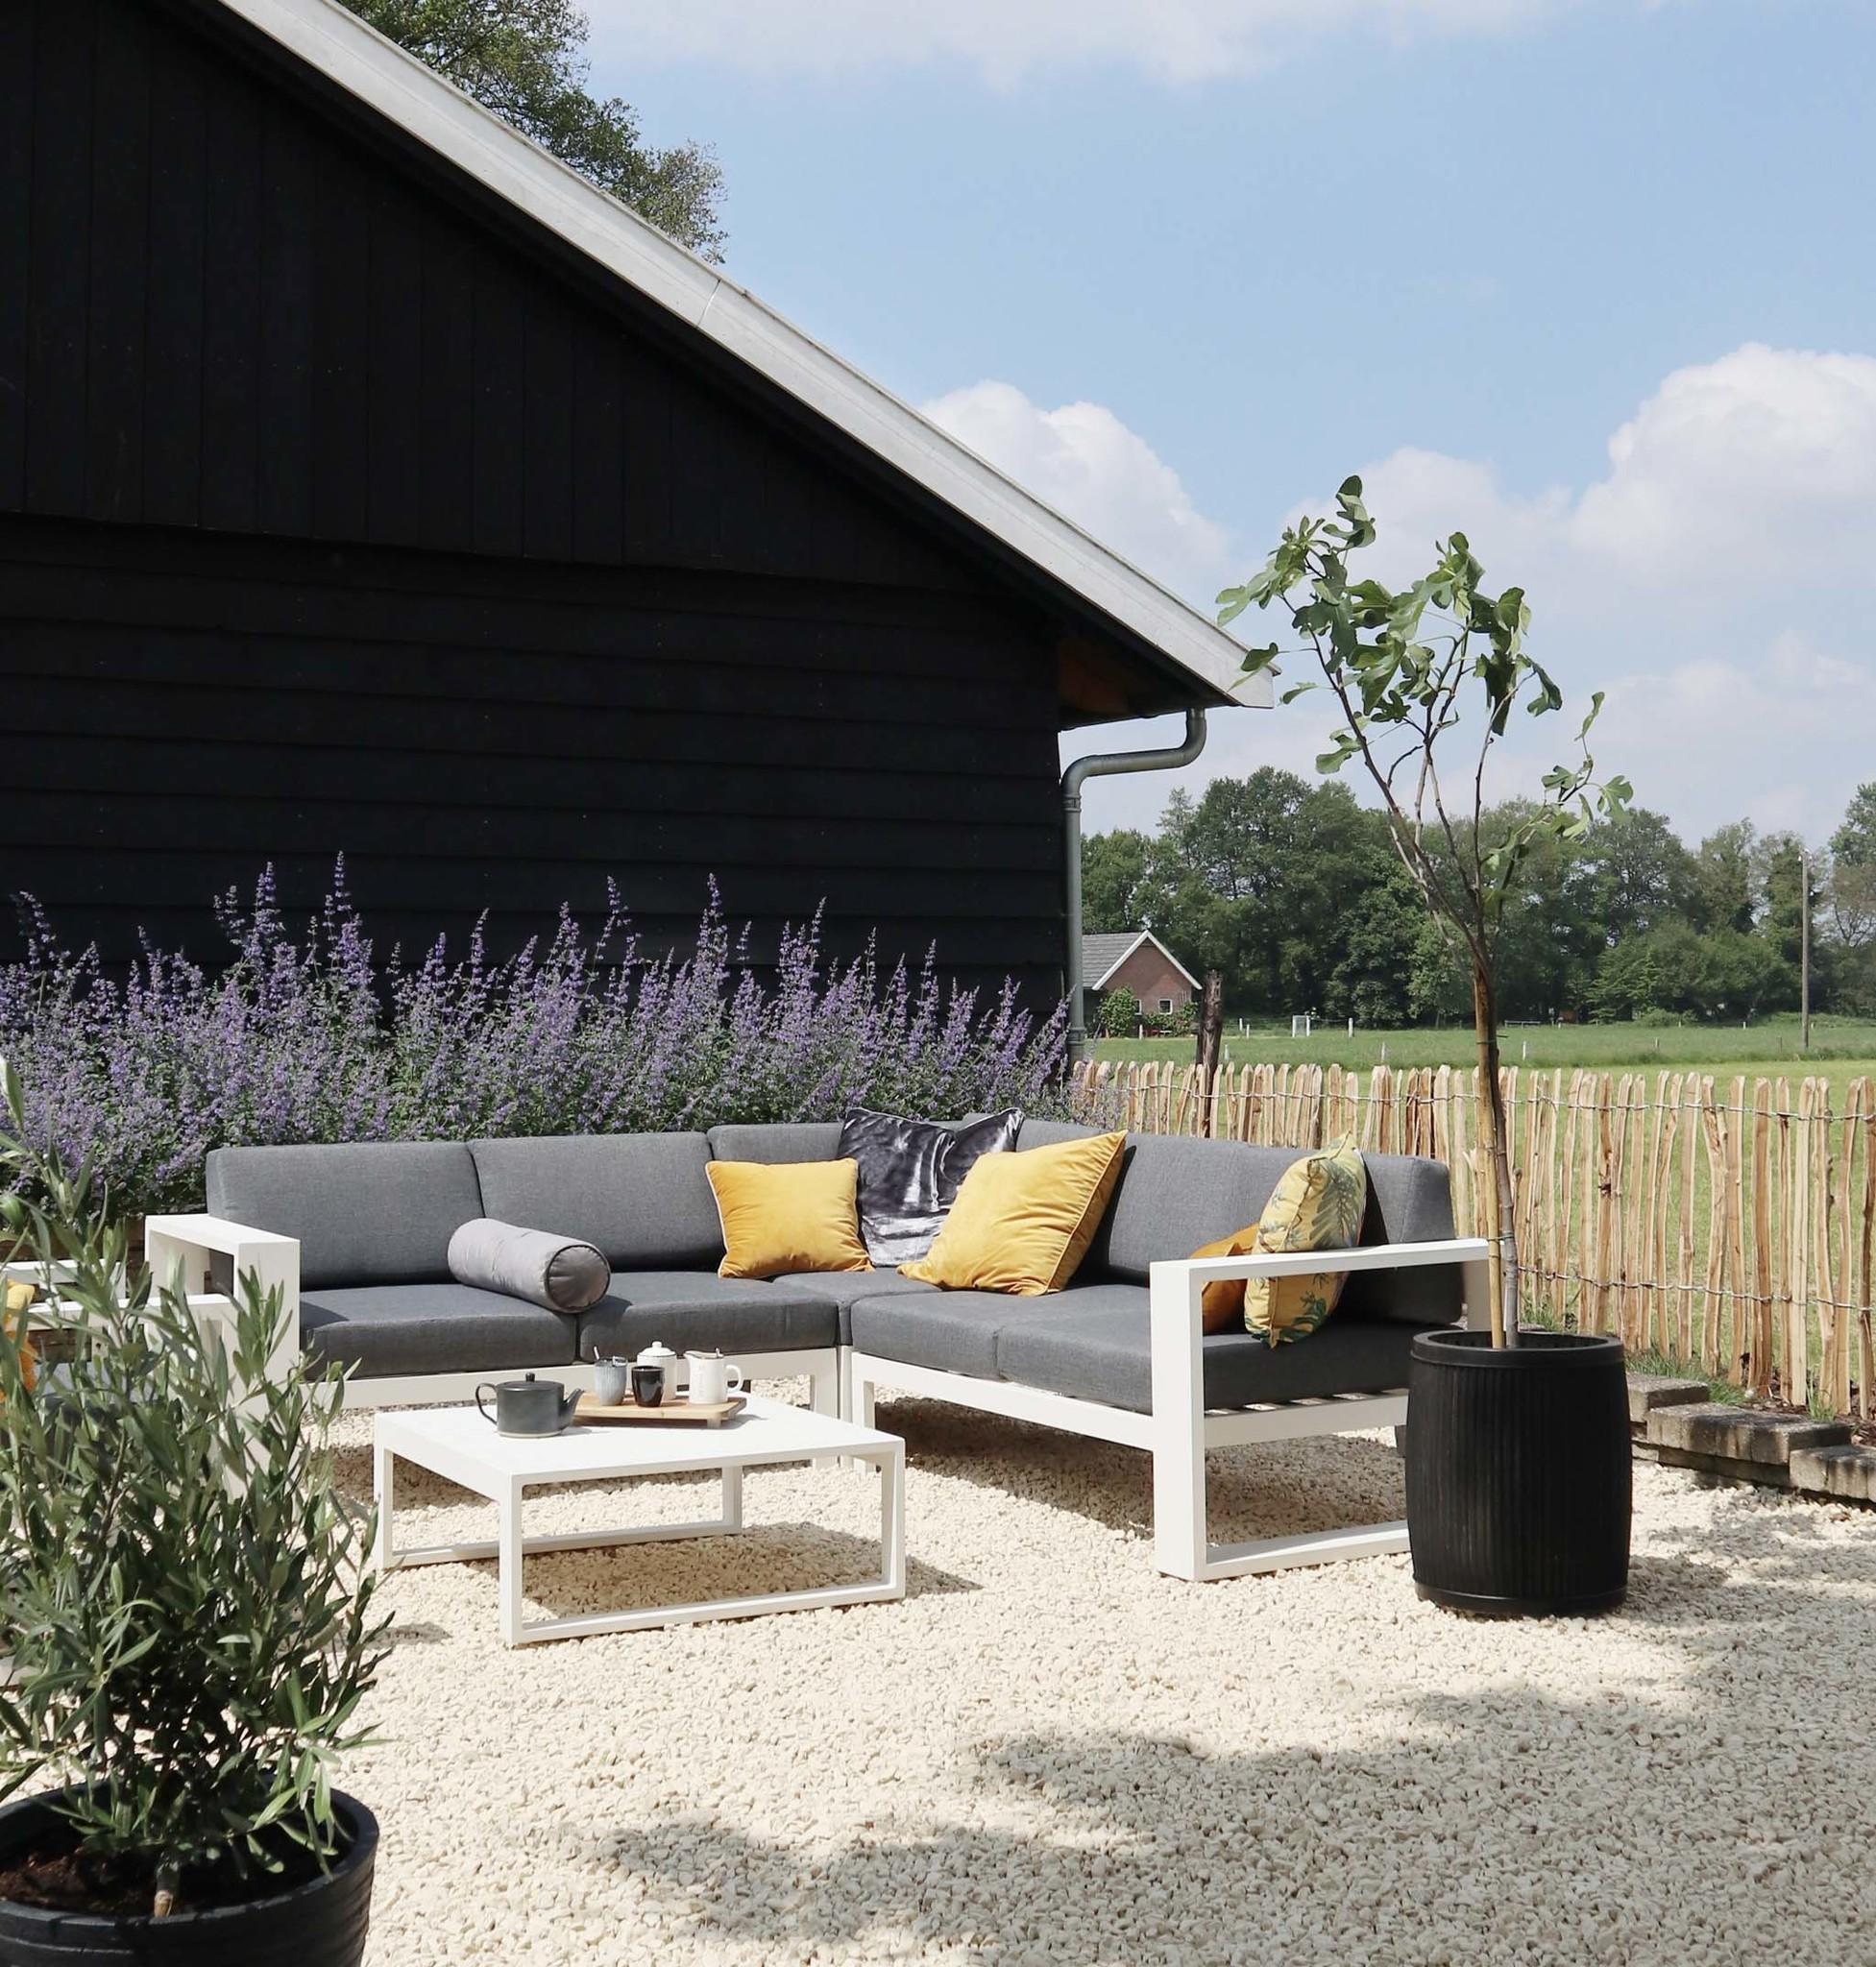 Witte tuinmeubelen